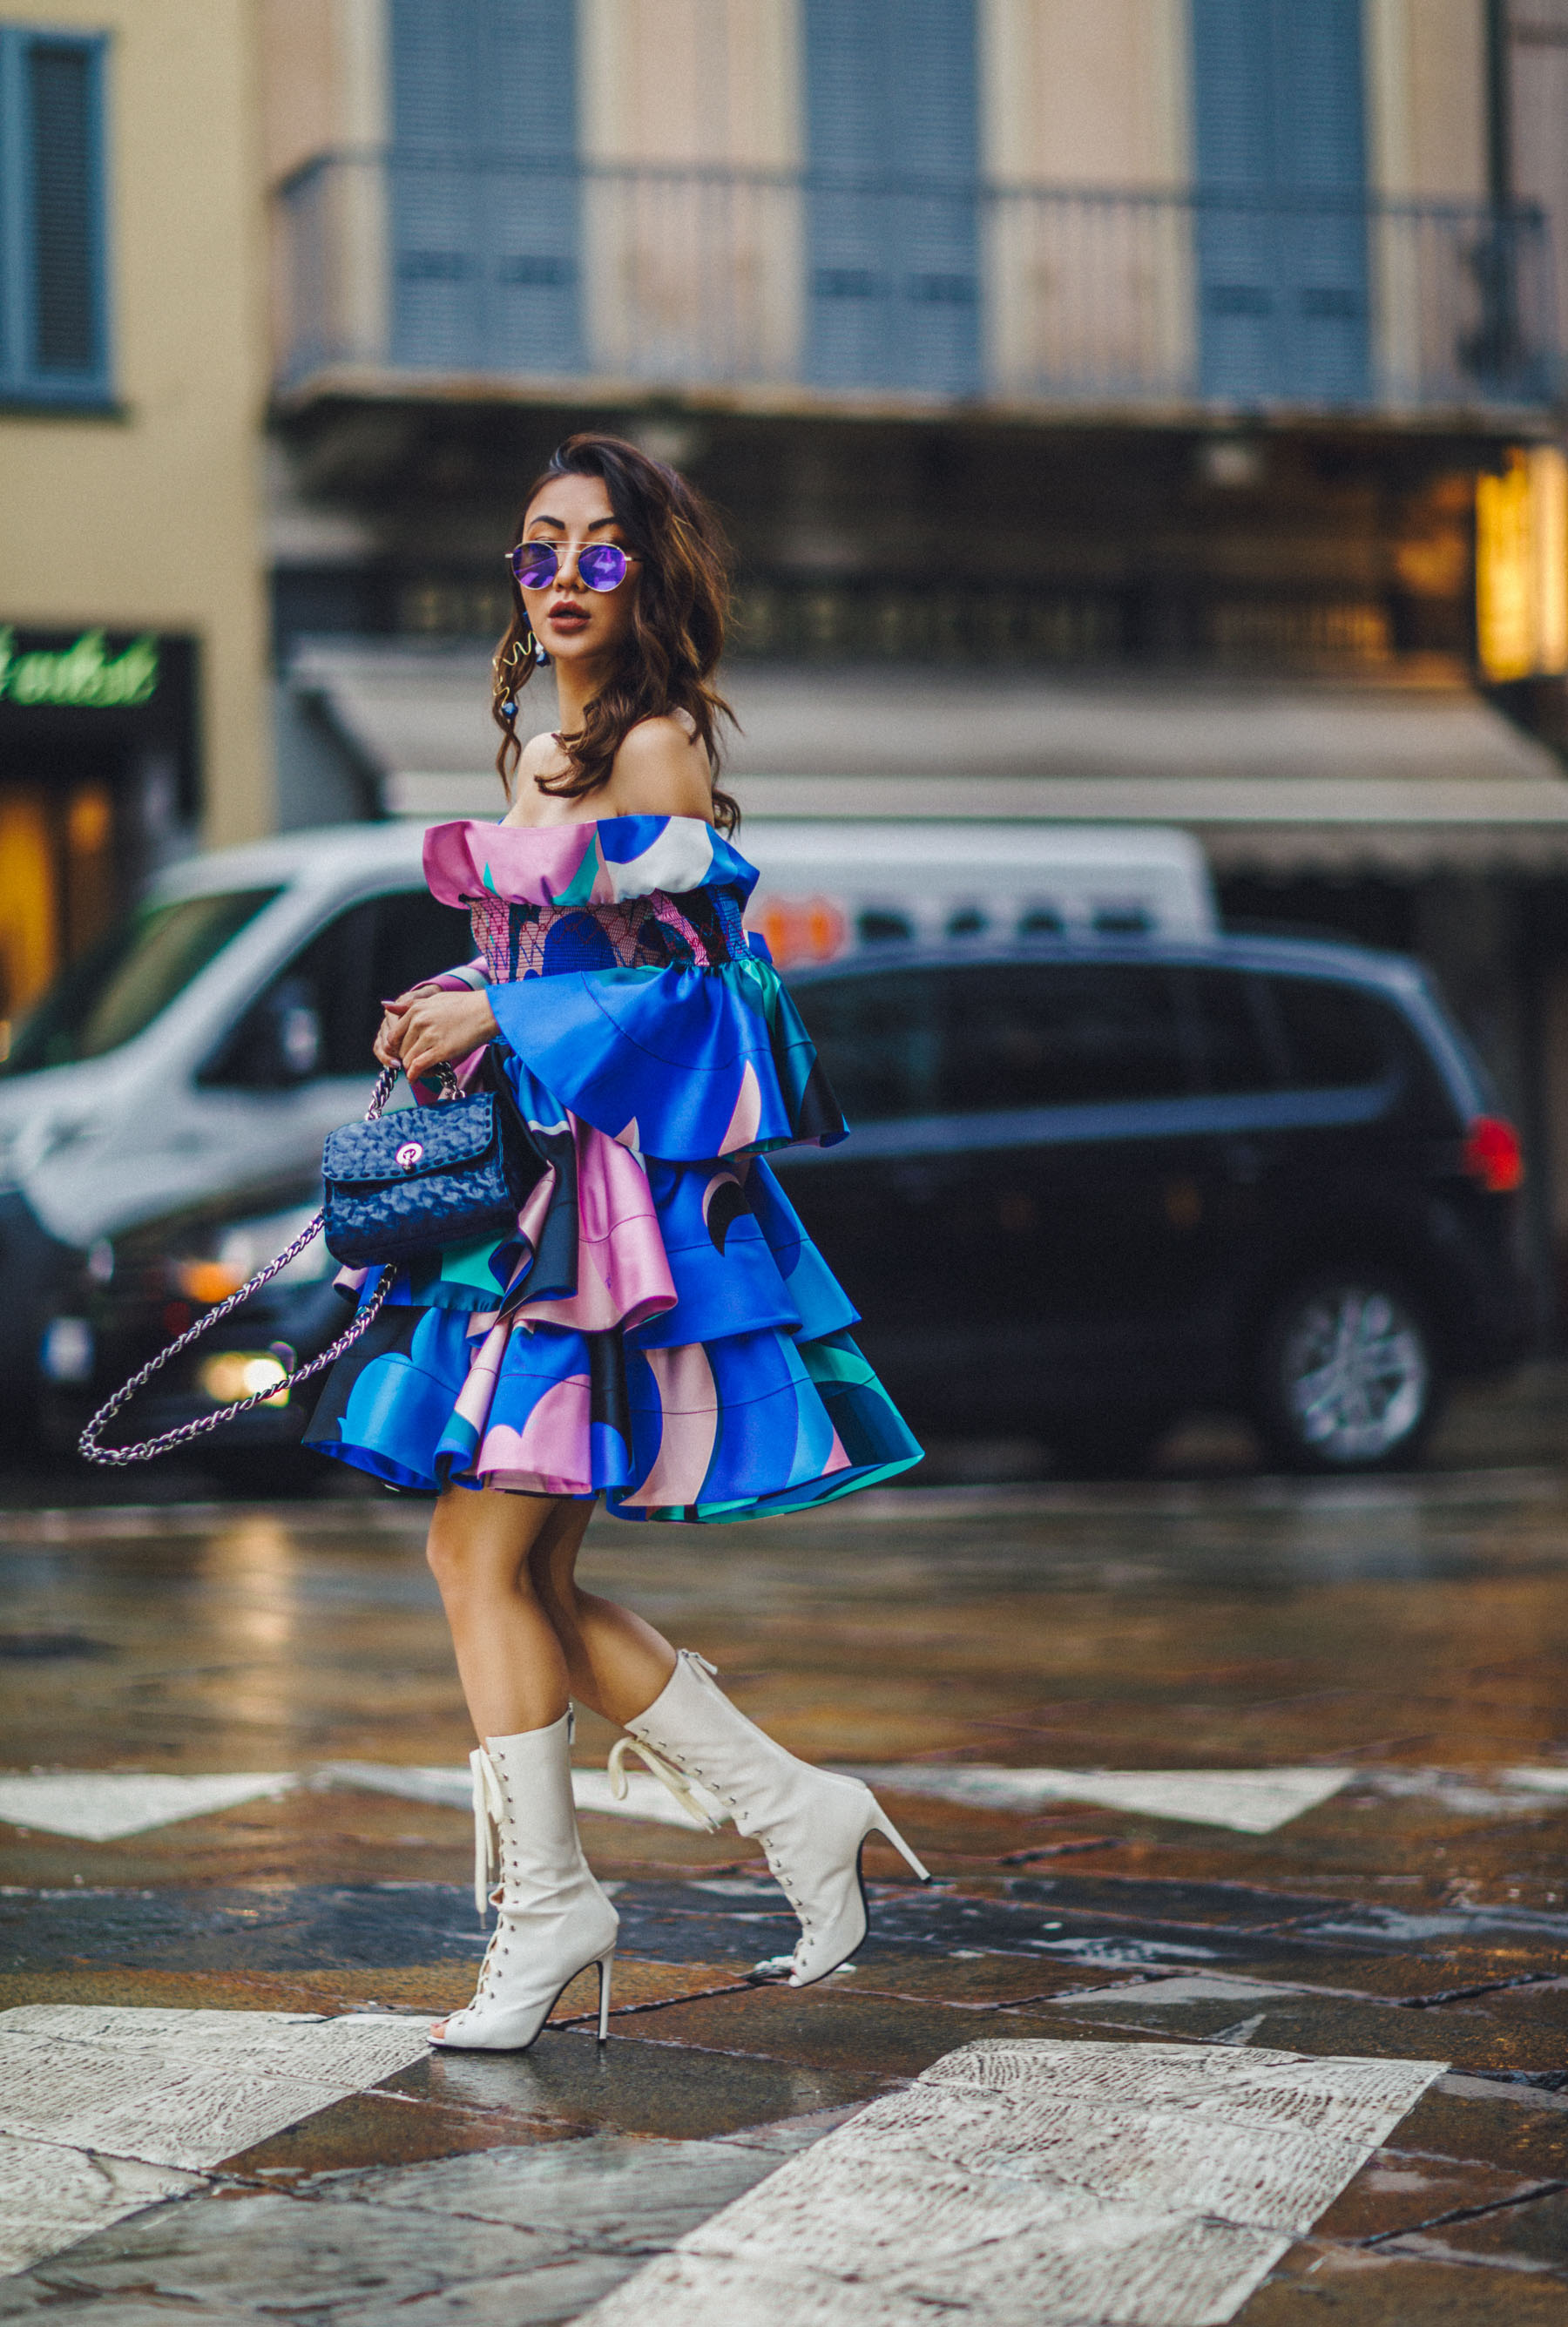 MFW Recap - Emilio Pucci Look, MFW Street Style, Emilio Pucci Dress, White Lace Up Heels // Notjessfashion.com